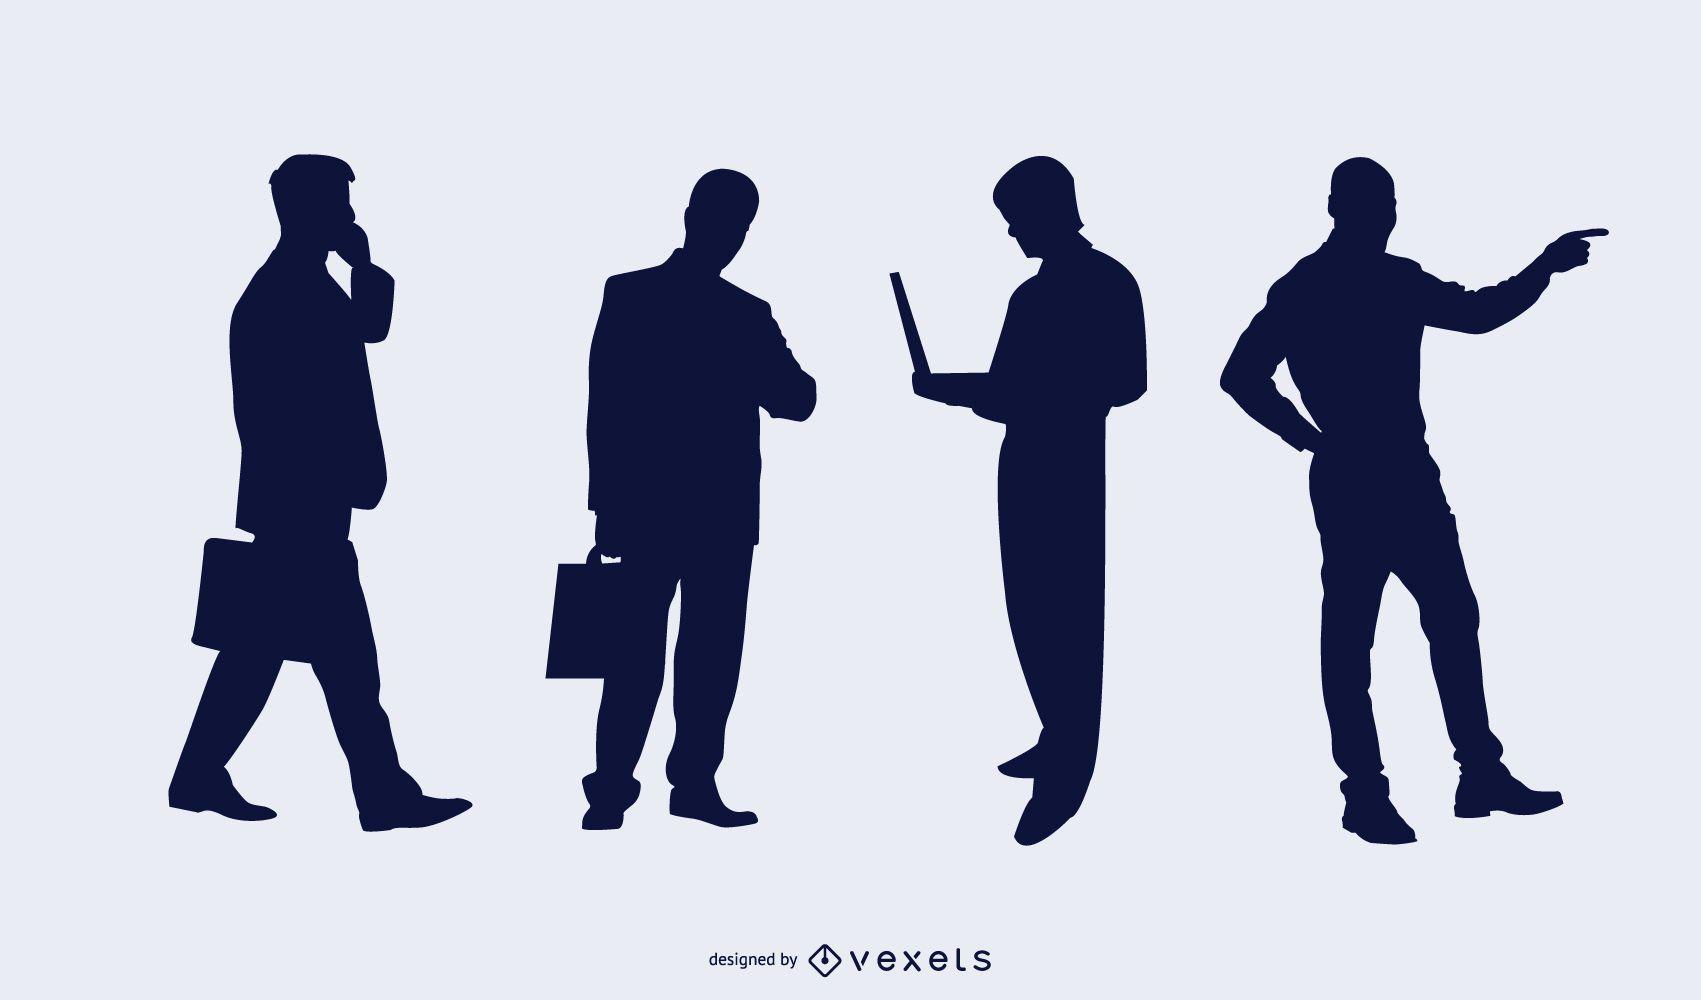 Pack silueta de personas de negocios